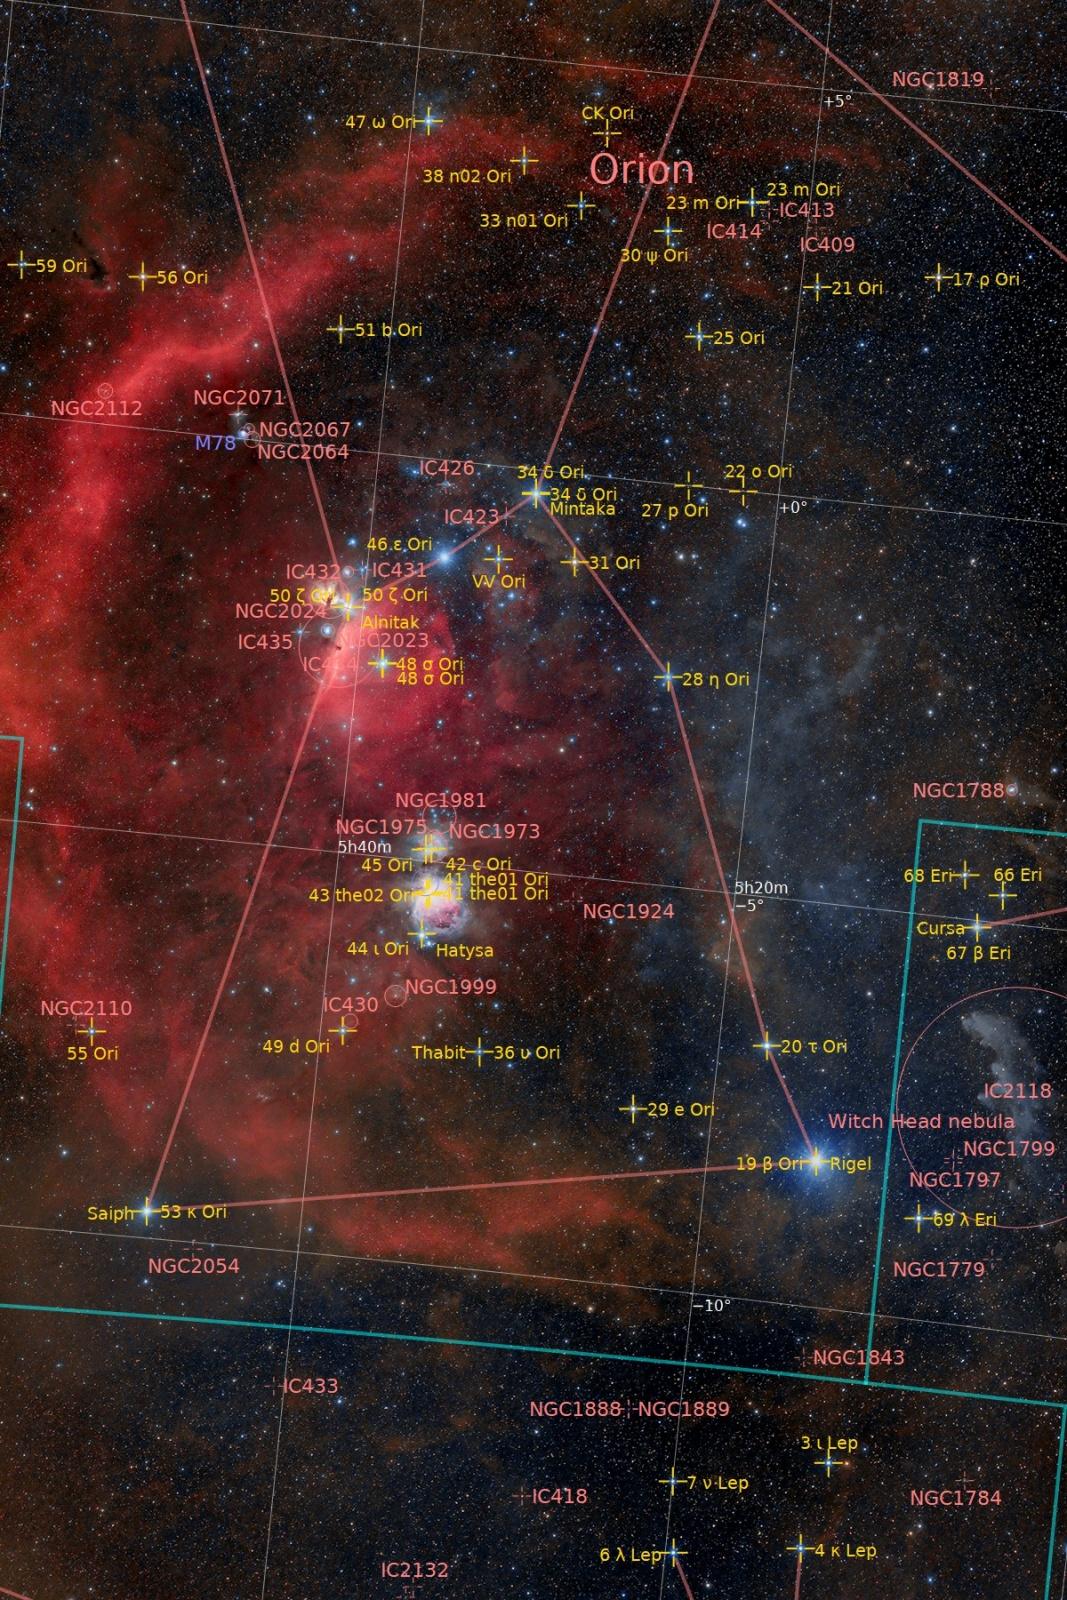 Orion_105mm_f1_4_Koryciny_21_11_2020_fina__new_1800px_Annotated.thumb.jpg.620c583bd279ebe6e0807ea84613a087.jpg